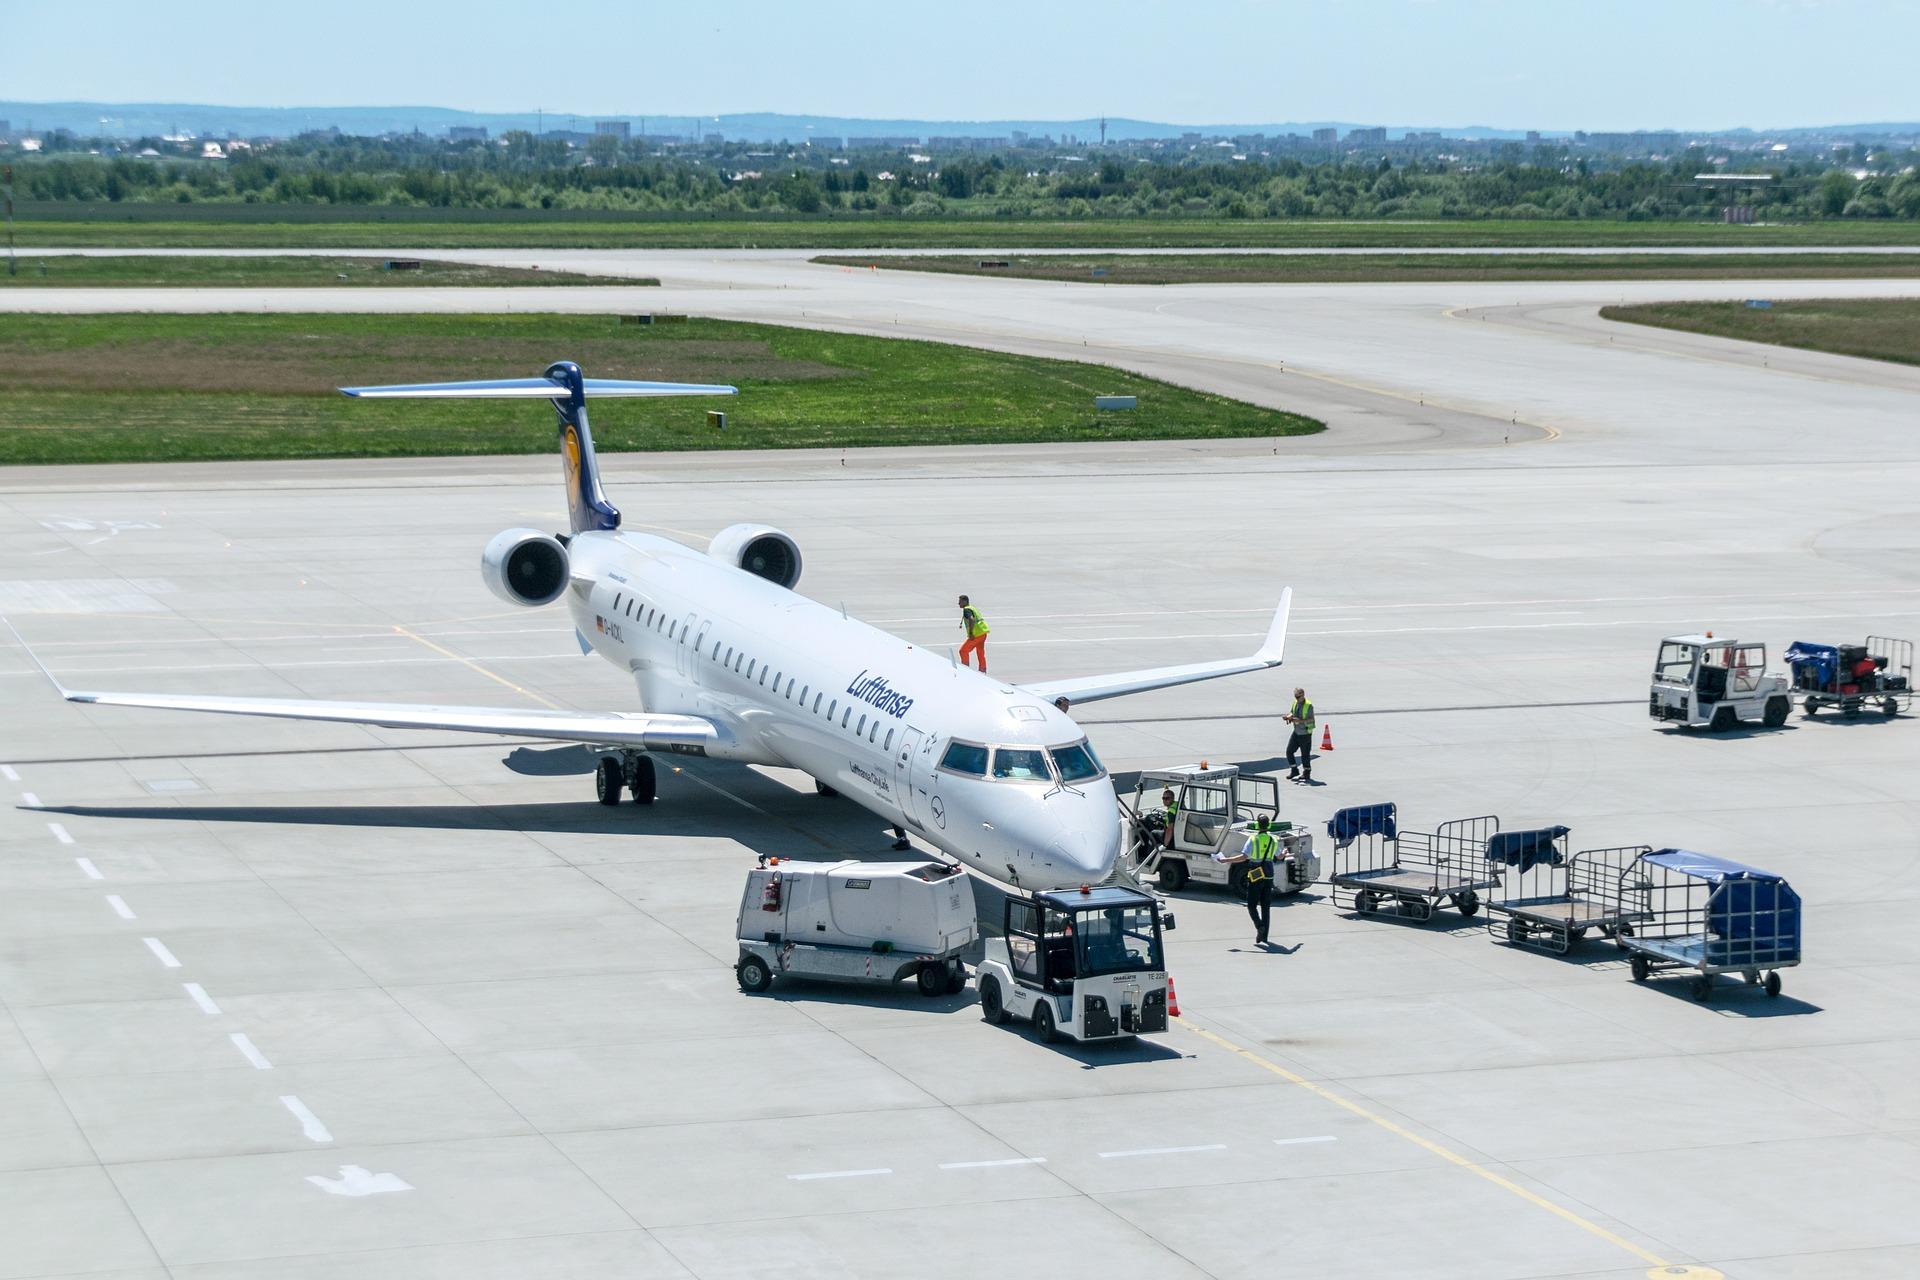 Švejcarśka aviakompanija vidnovljuje rejsy do Boryspolja